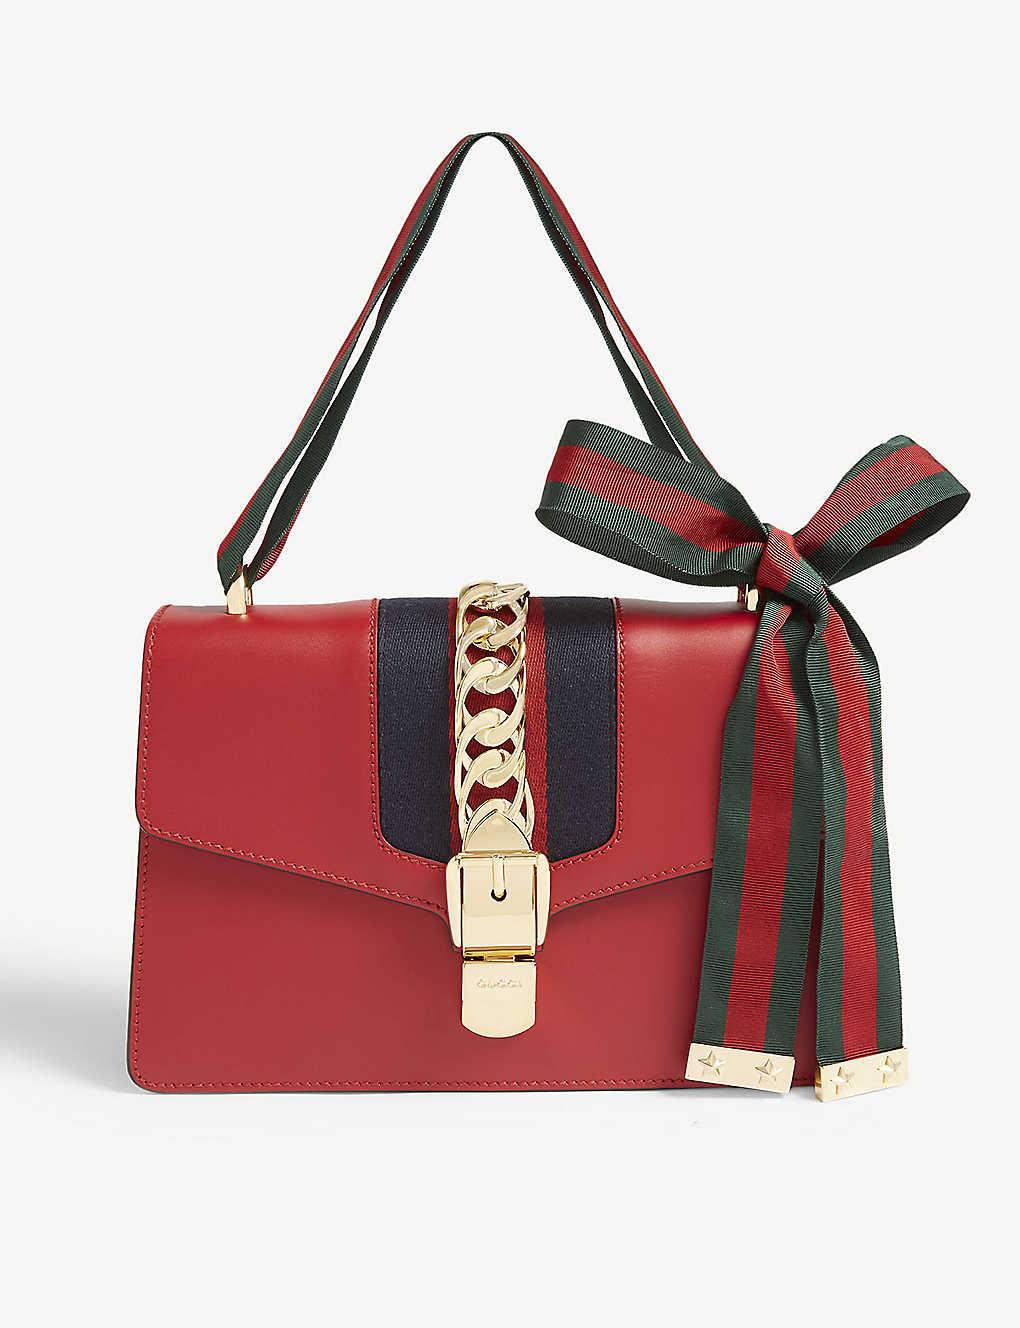 2929aaafd48c85 GUCCI - Sylvie leather shoulder bag   Selfridges.com